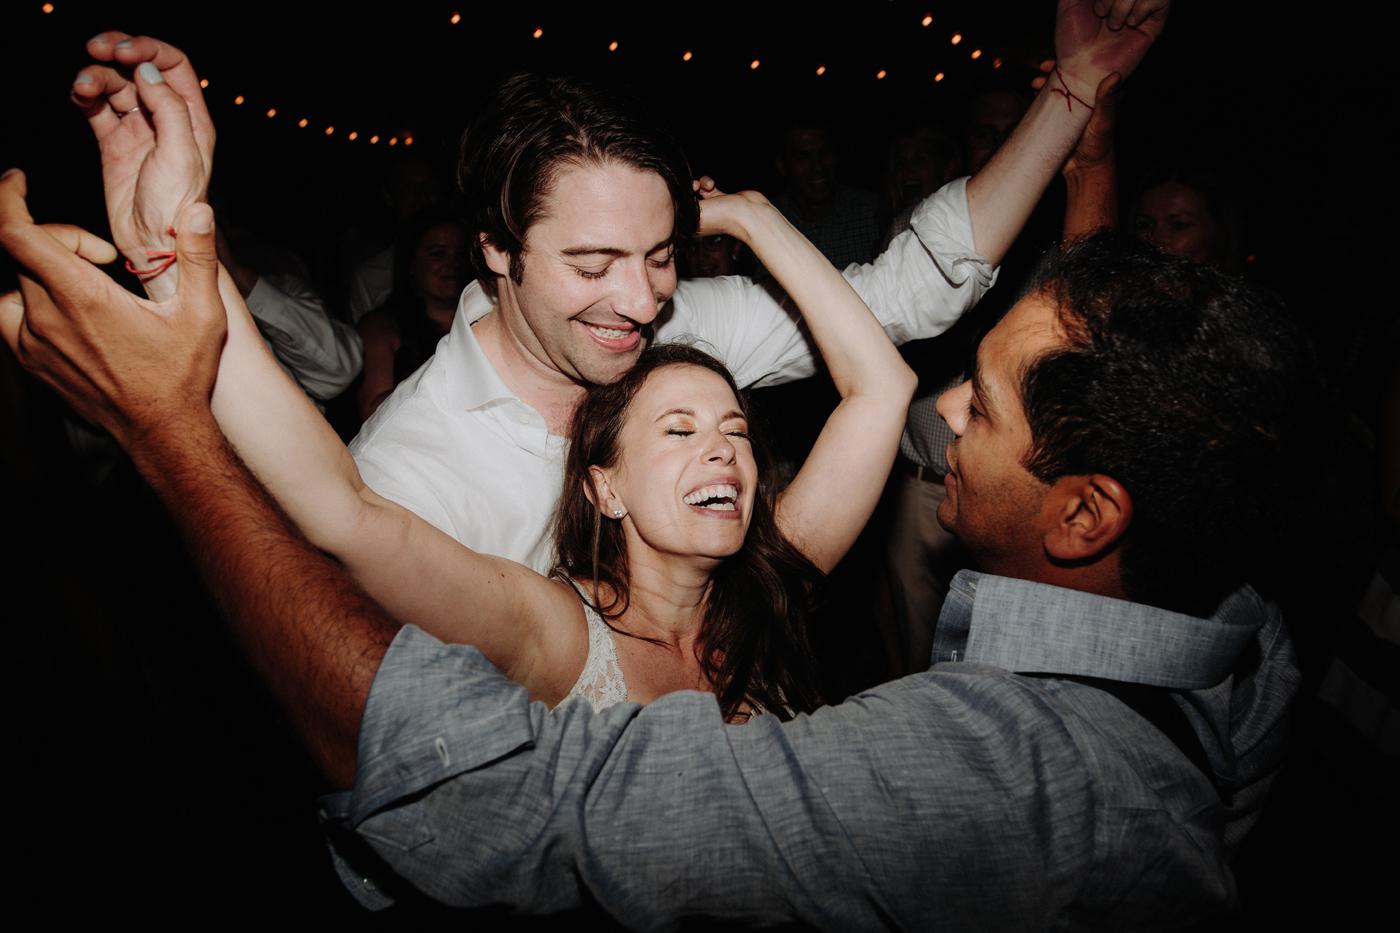 143-grand-teton-jackson-hole-wyoming-wedding.jpg